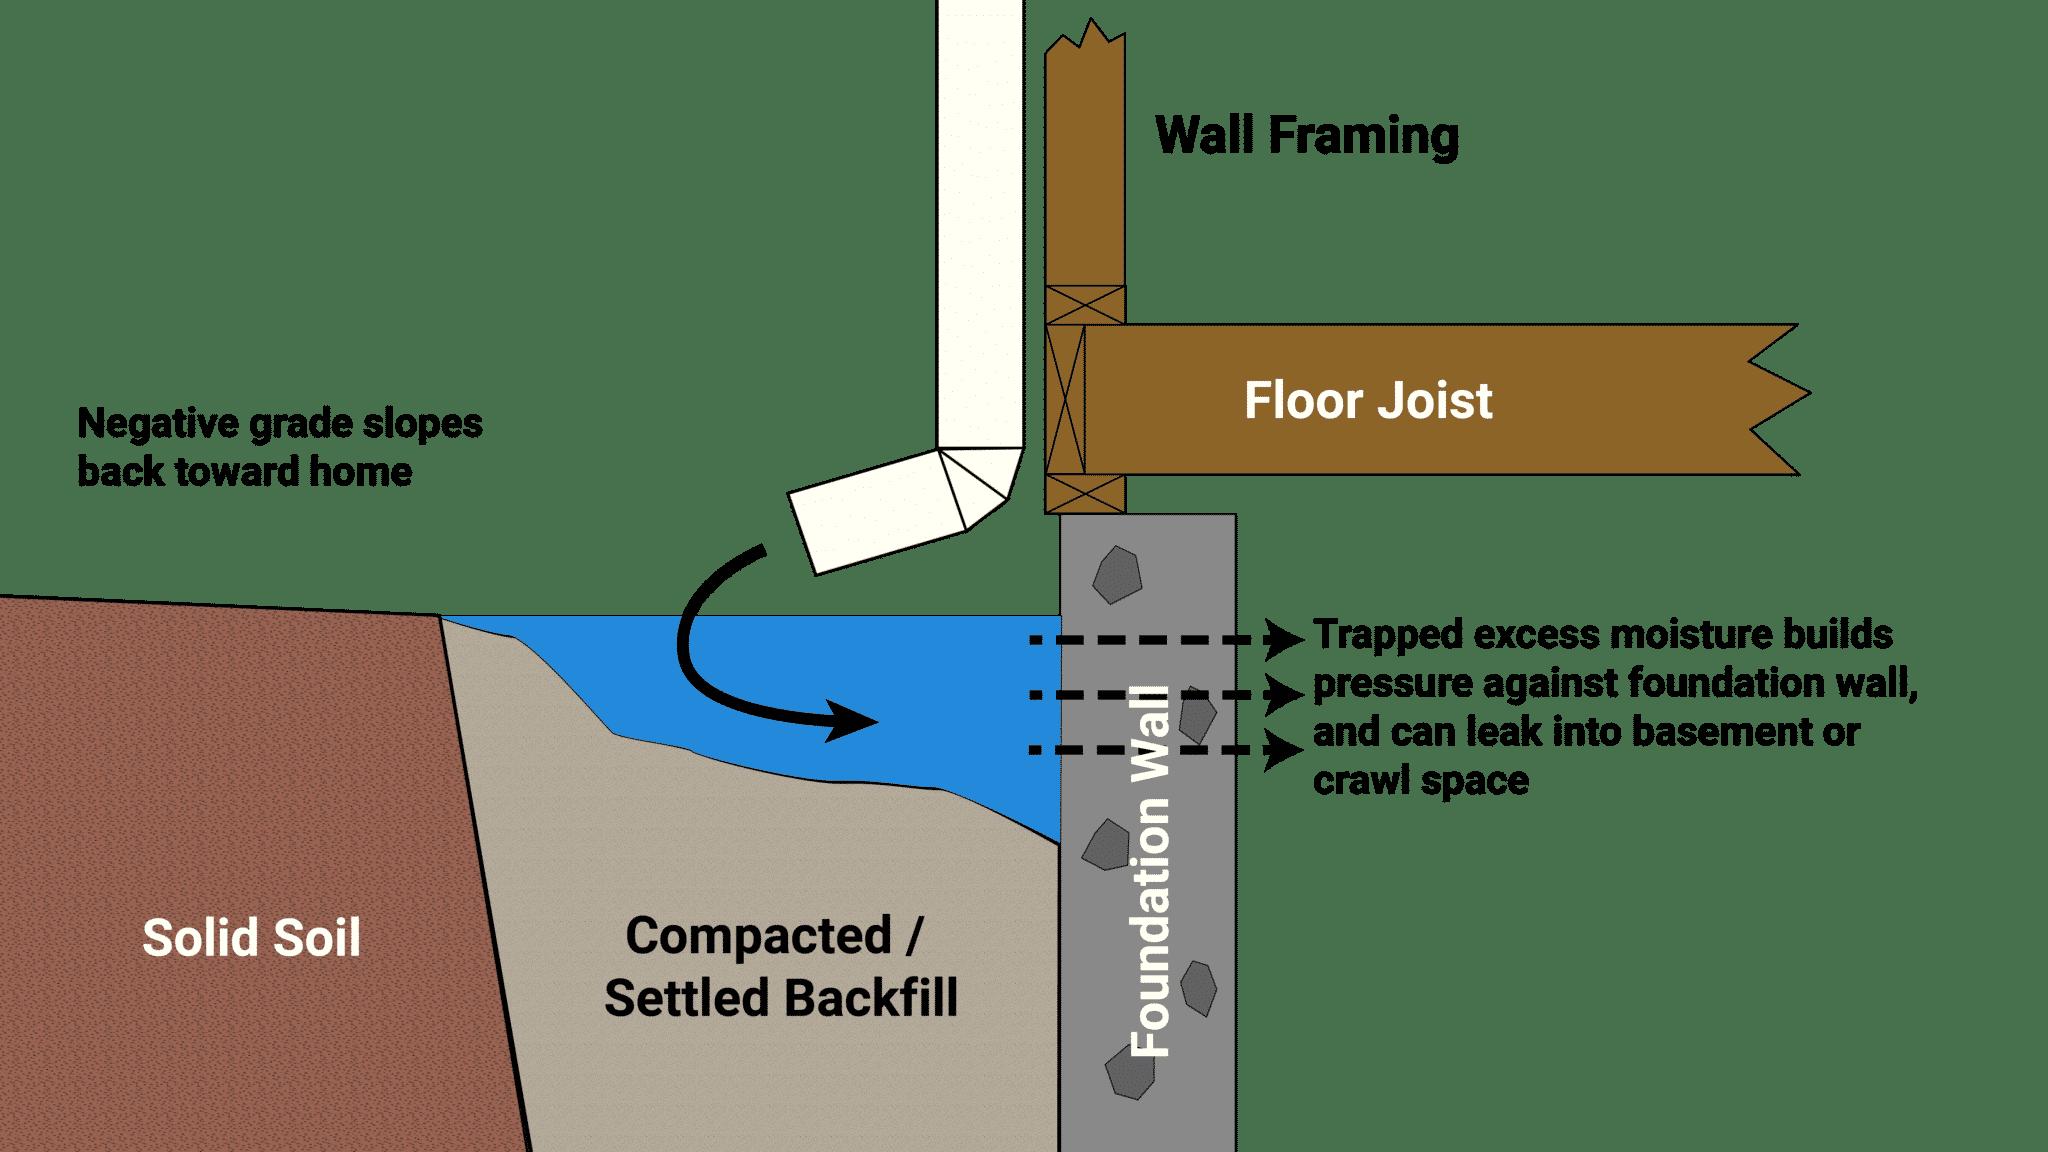 MDH Foundation Repair Foundation Drainage Problems Bad Drainage